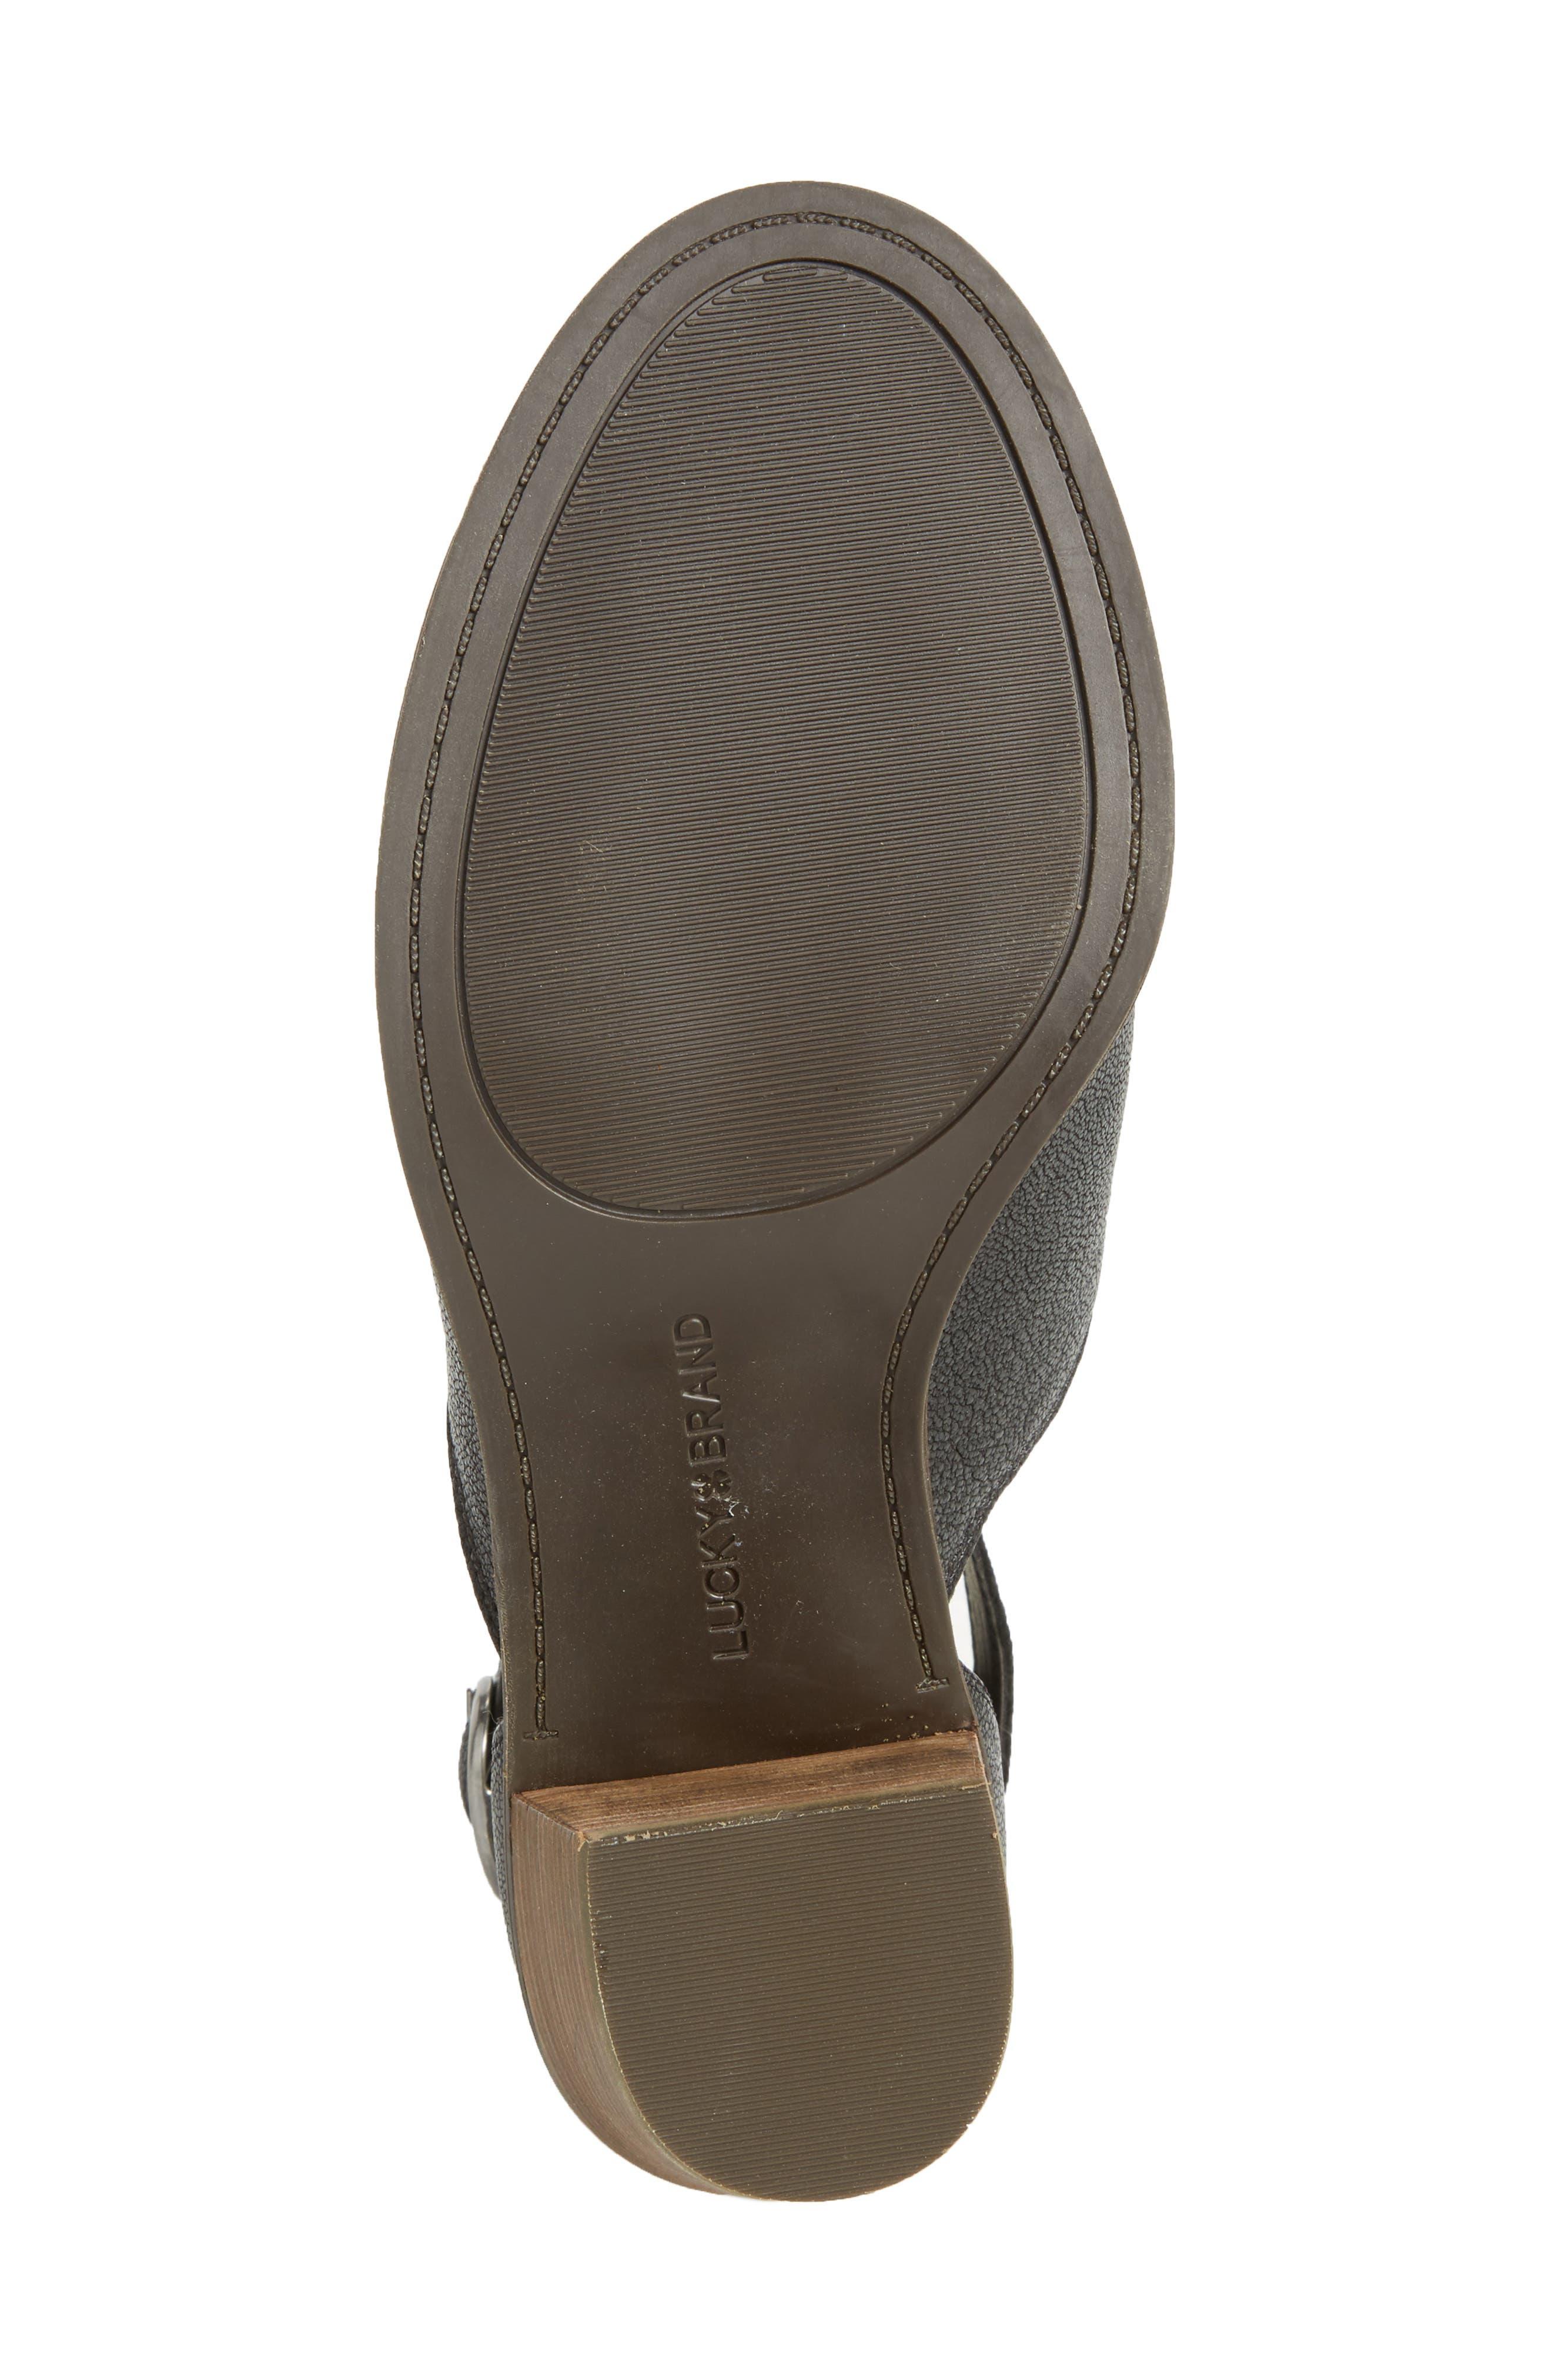 Kadian Block Heel Sandal,                             Alternate thumbnail 11, color,